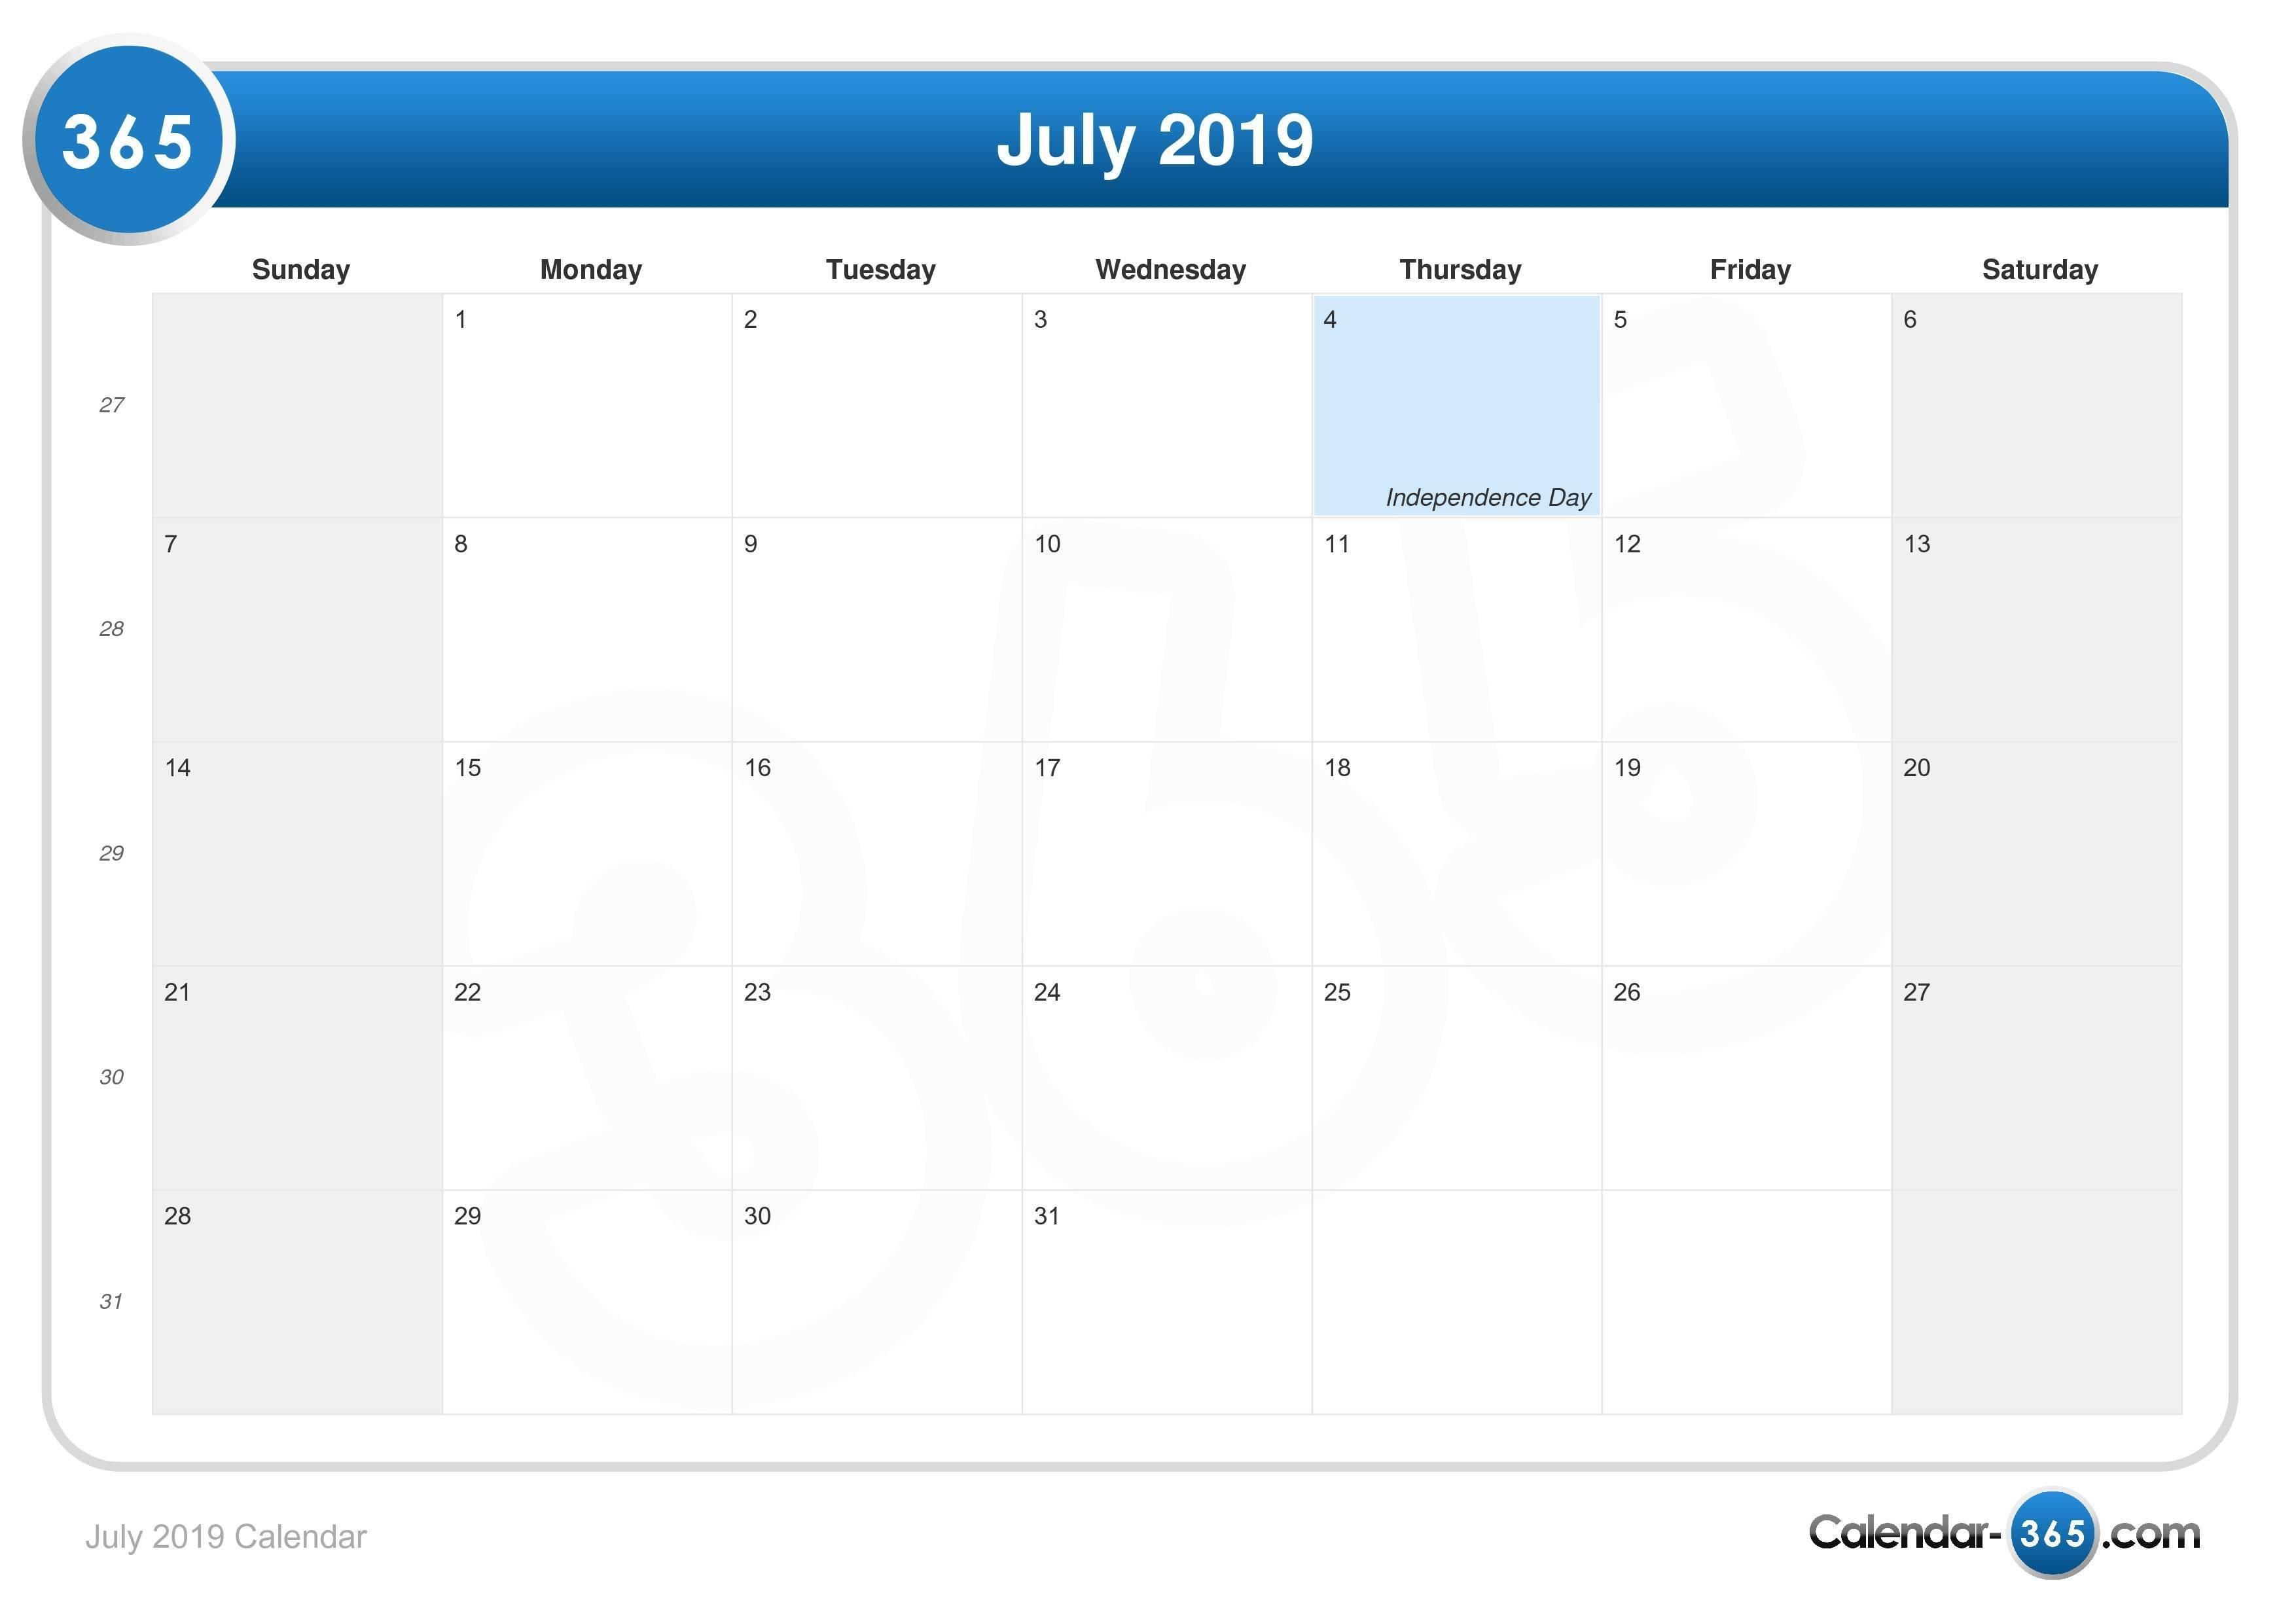 July 2019 Calendar July 2 2019 Calendar